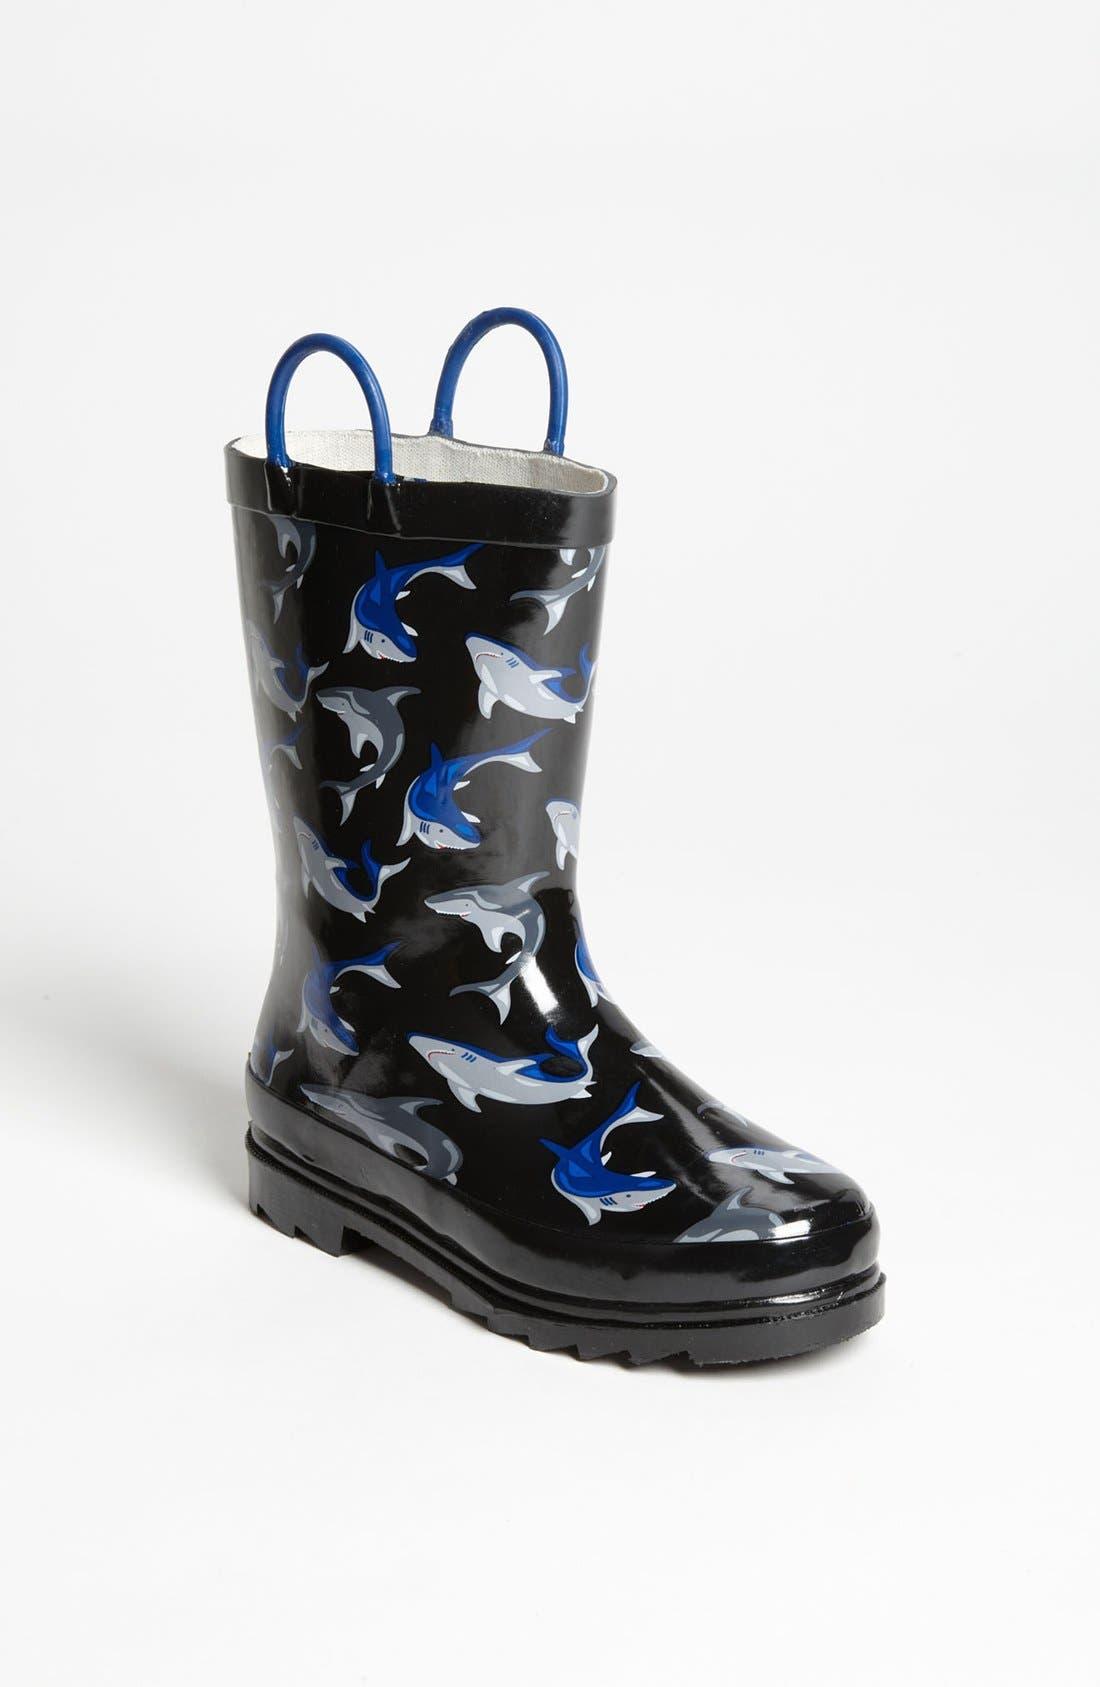 Alternate Image 1 Selected - Western Chief 'Shark City' Rain Boot (Toddler & Little Kid)